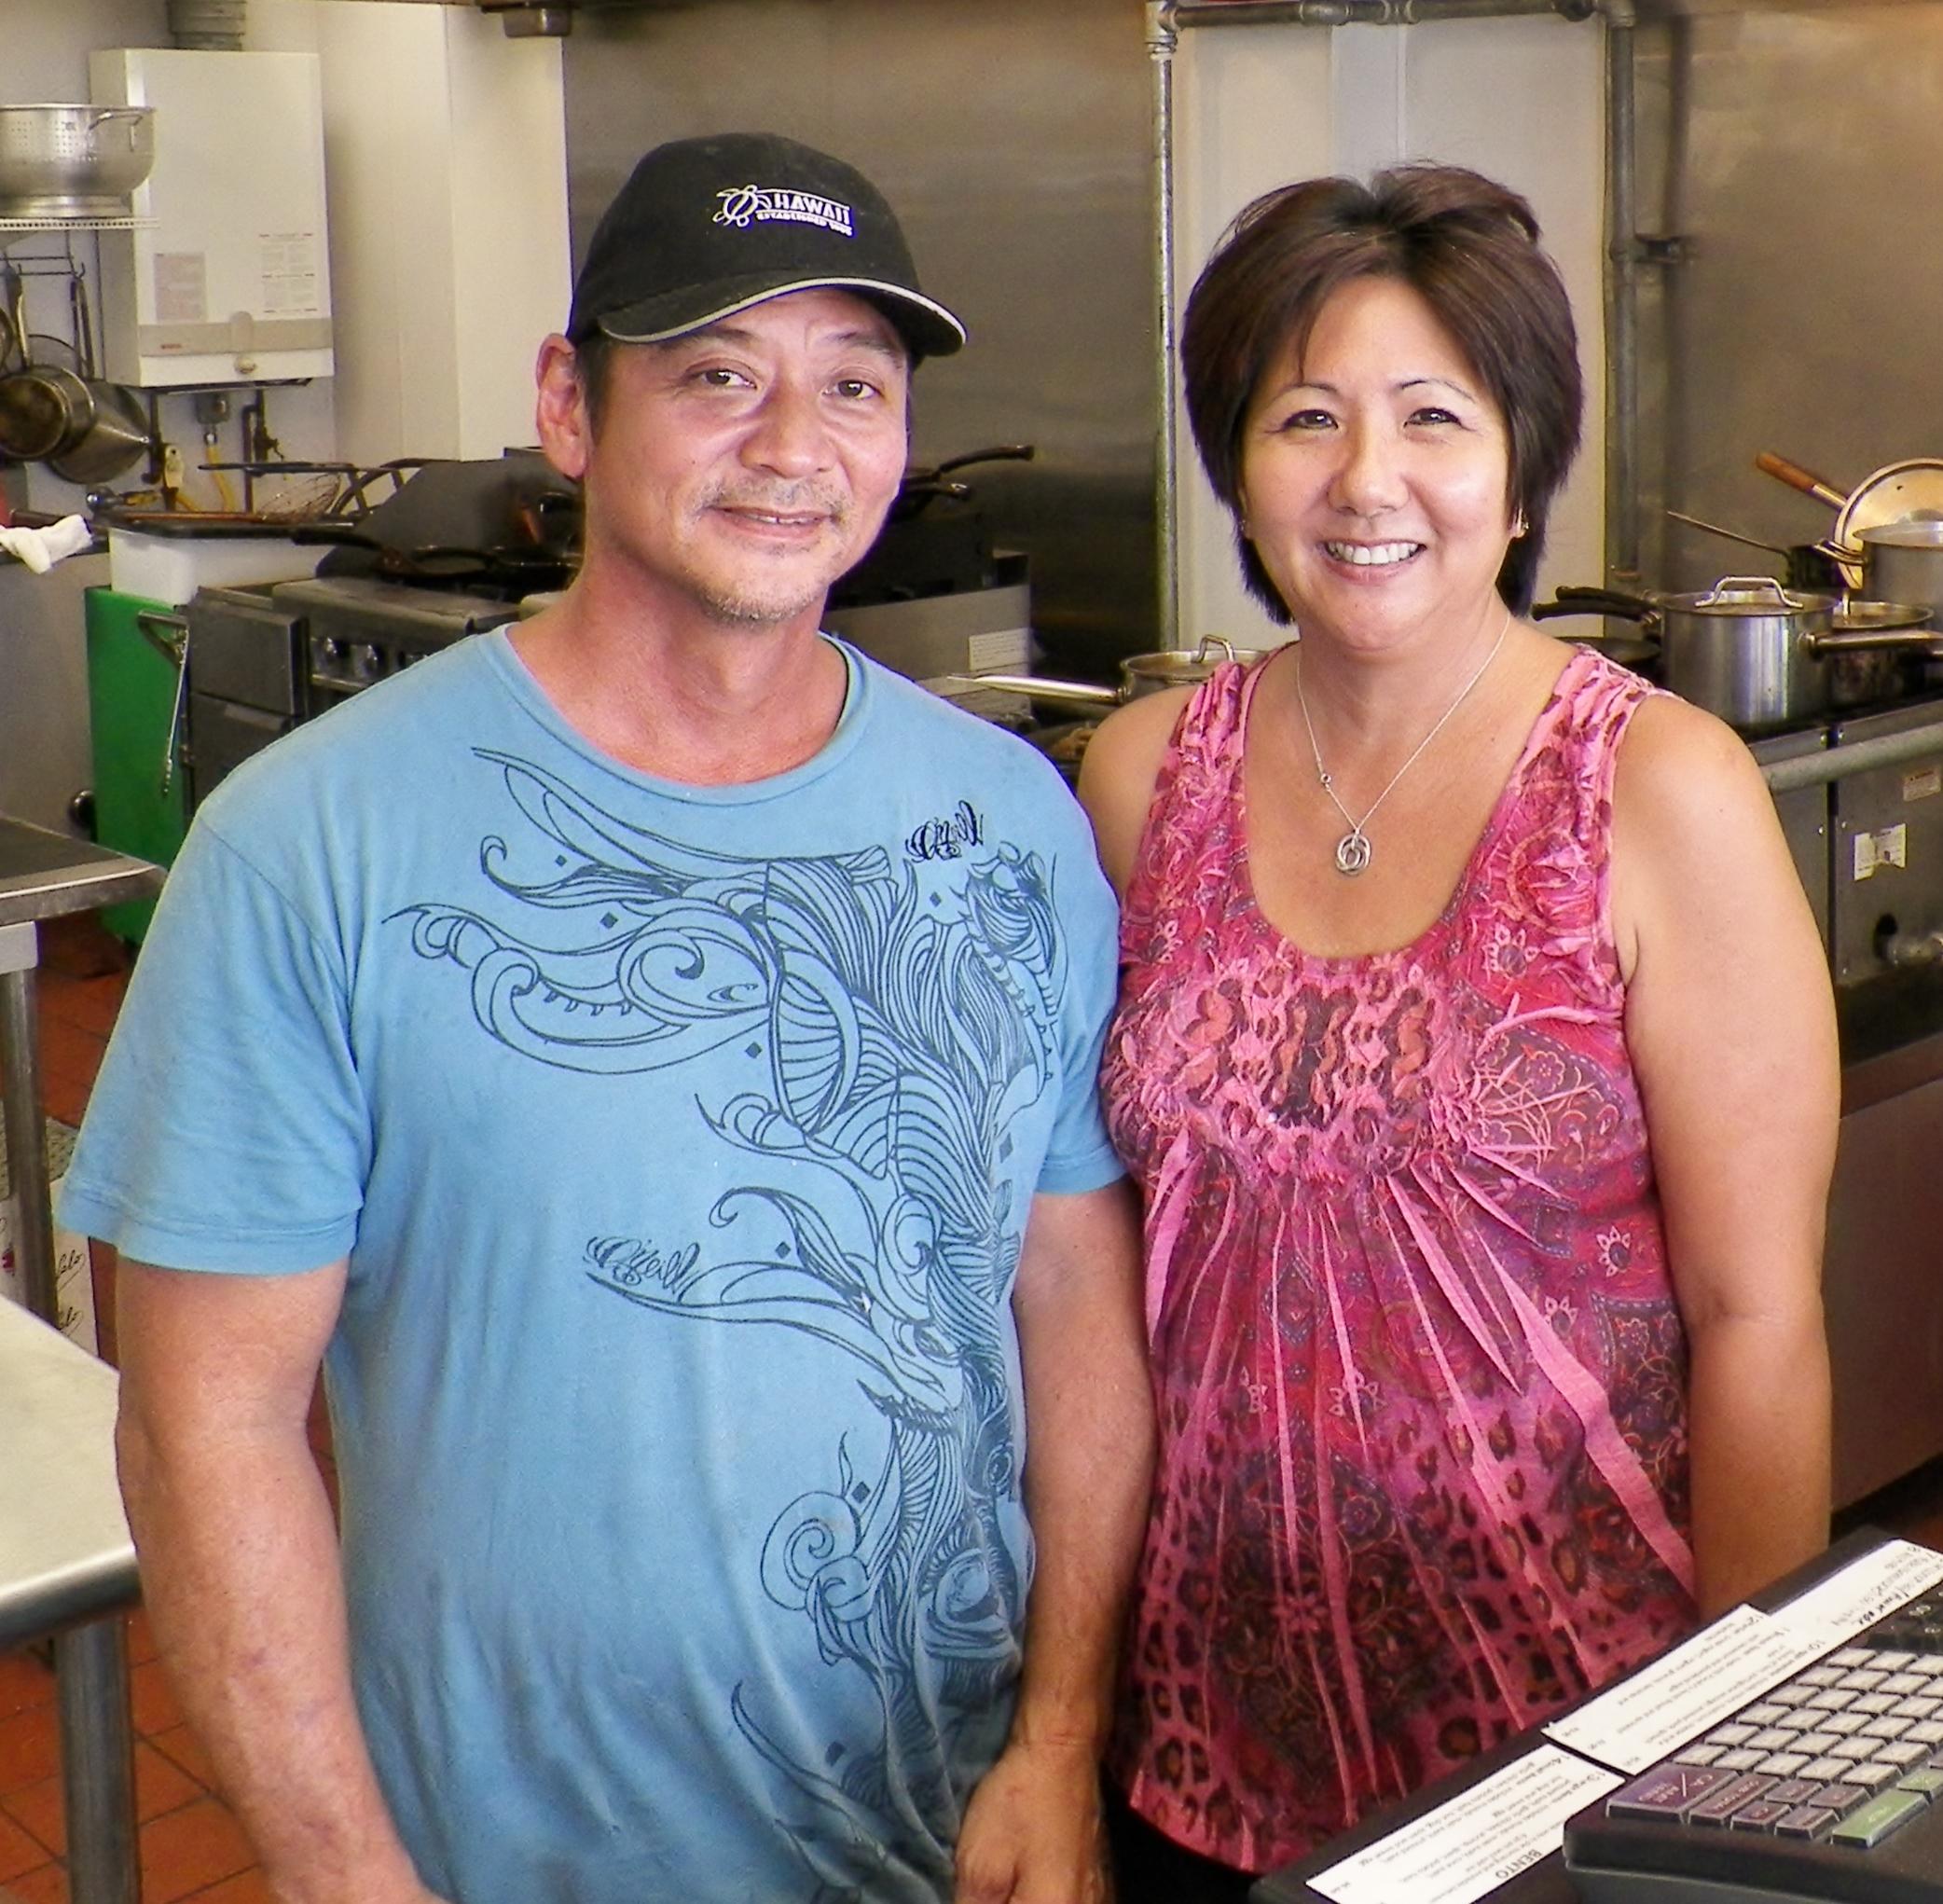 Cousins Seafood and Bento Making a Splash | Big Island Now